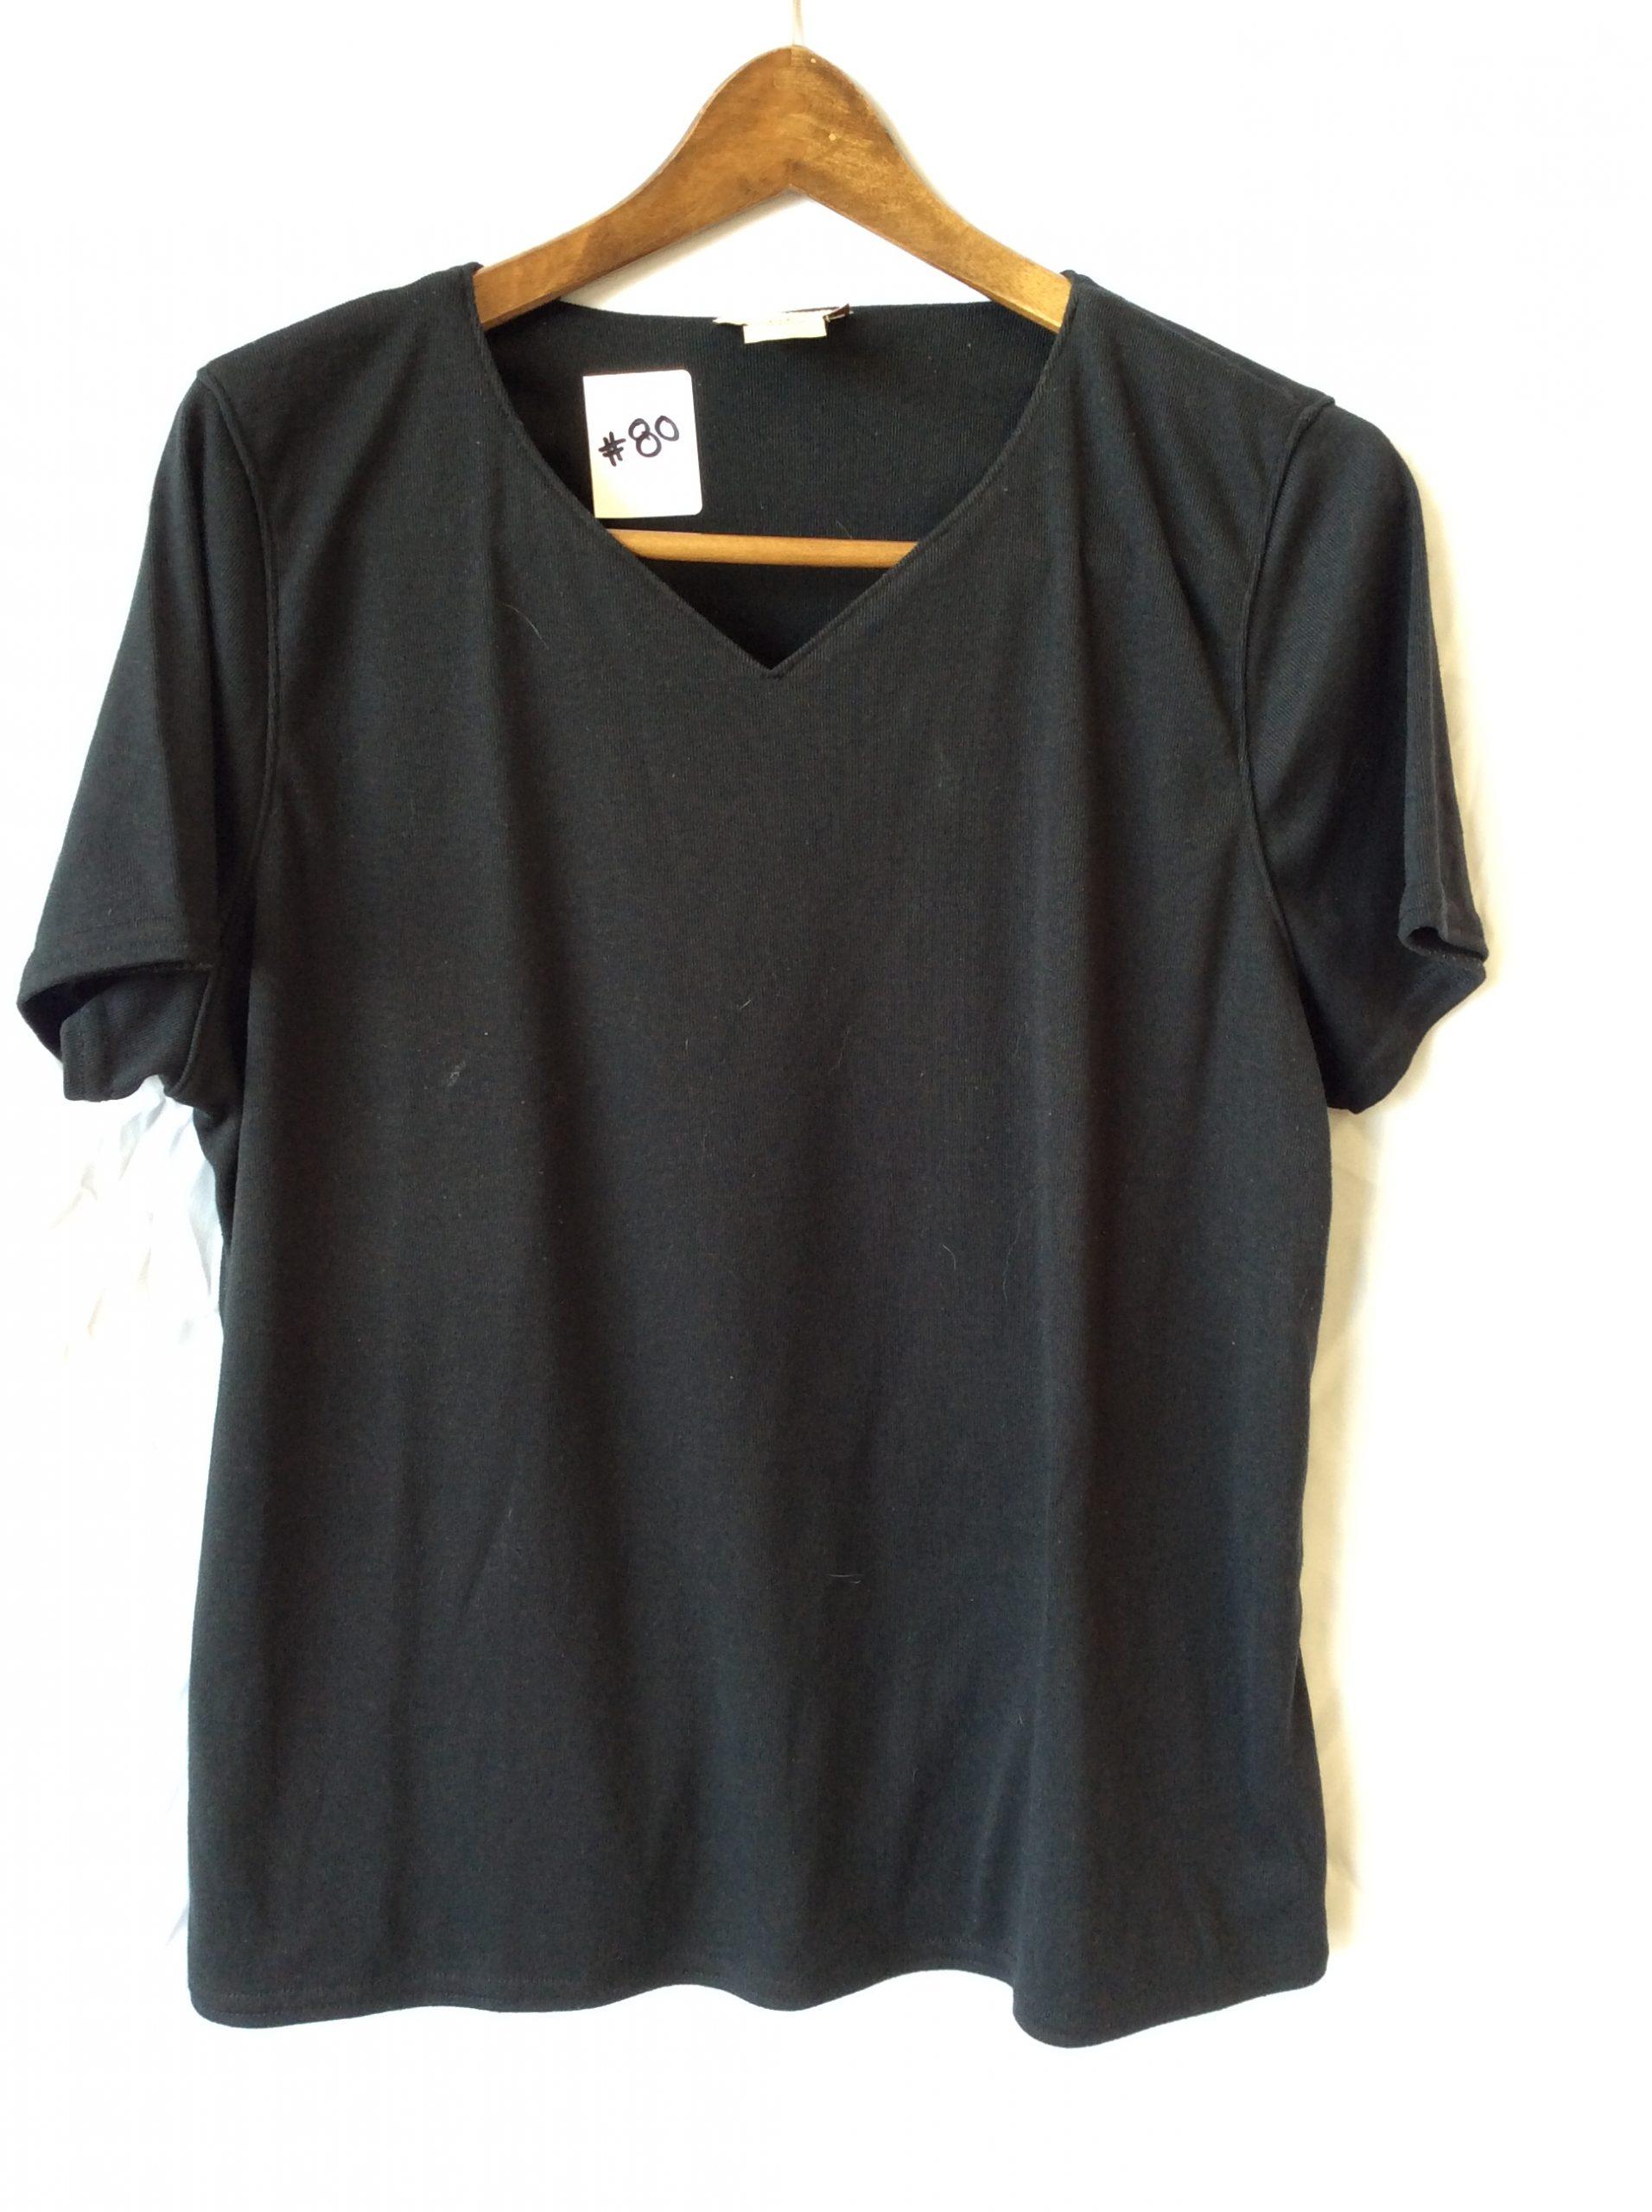 Women's black v-neck tee, size xl